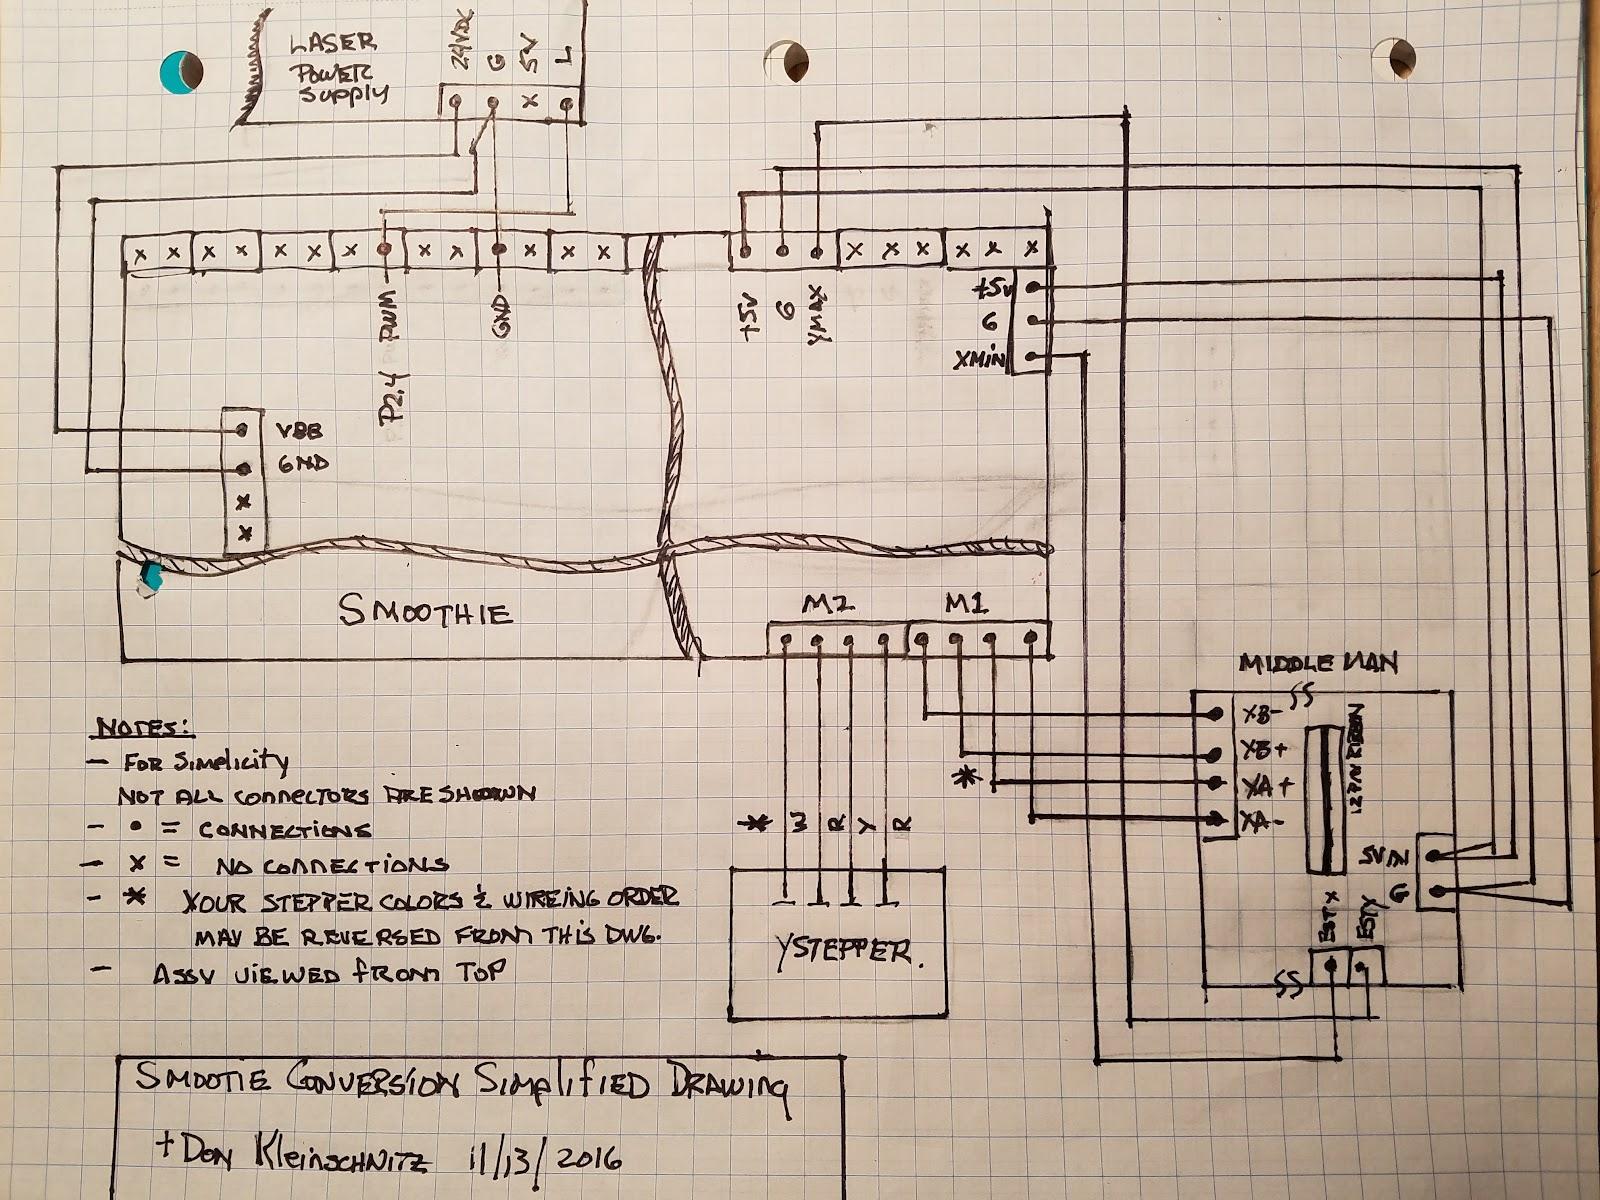 hight resolution of k40 laser wiring diagram wiring diagram advancek40 laser wiring diagram